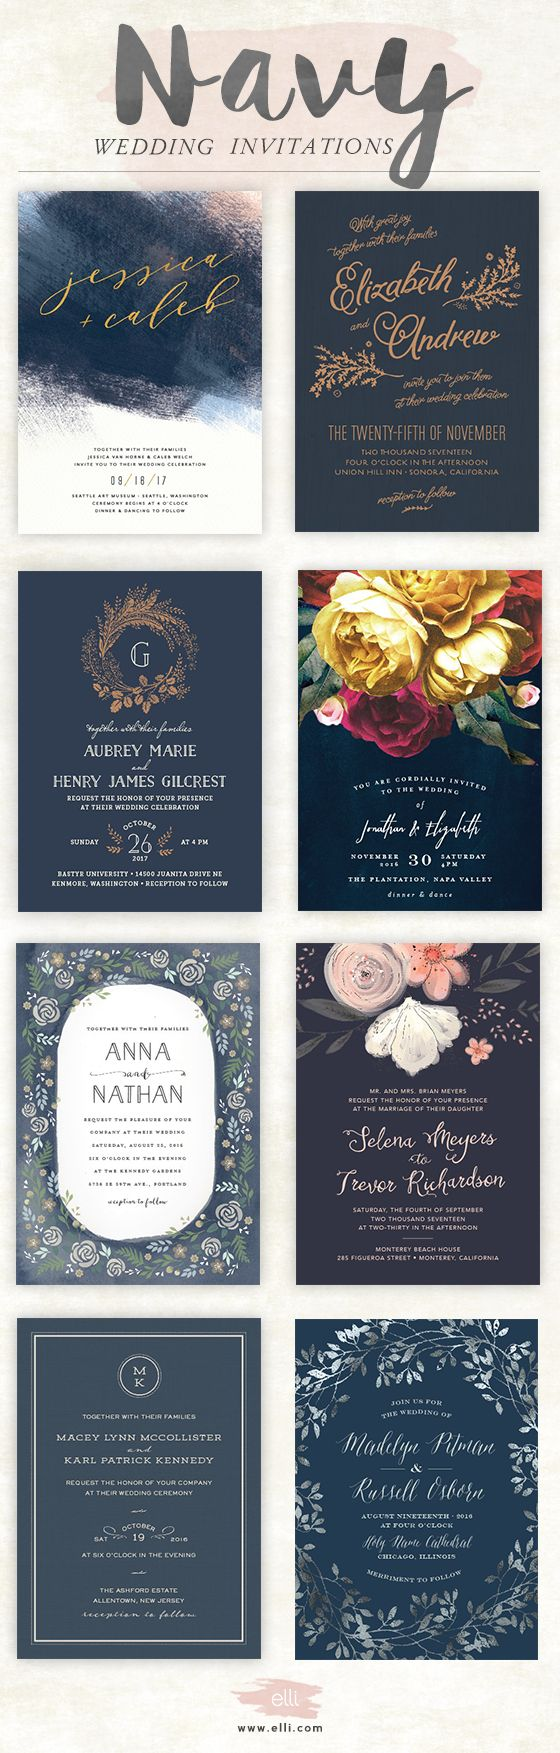 wildflower wedding invitation templates%0A executive director resume